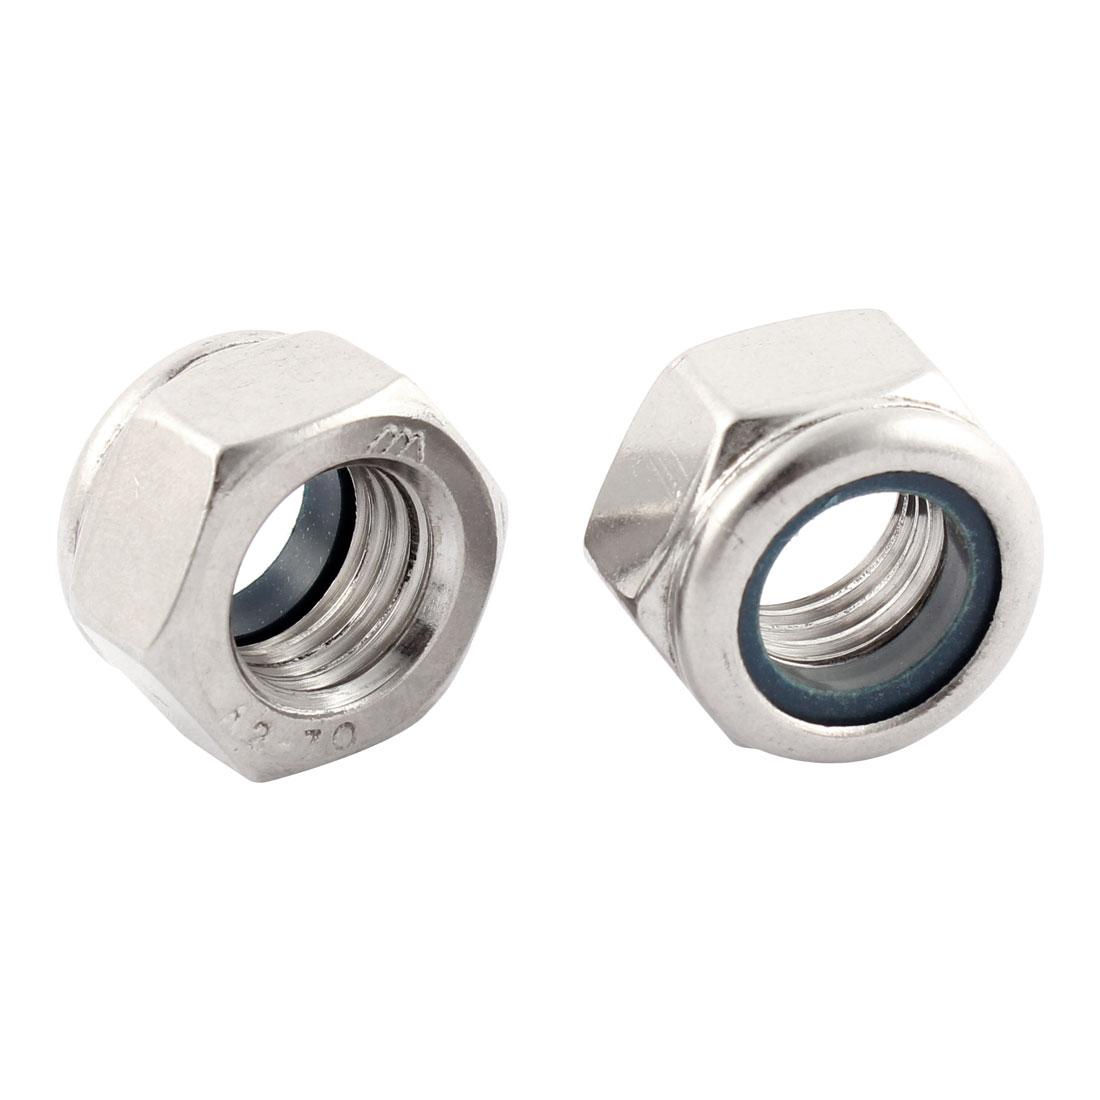 2pcs M16x2mm Stainless Steel Nylon Insert Lock Anti-loose Hex Nuts